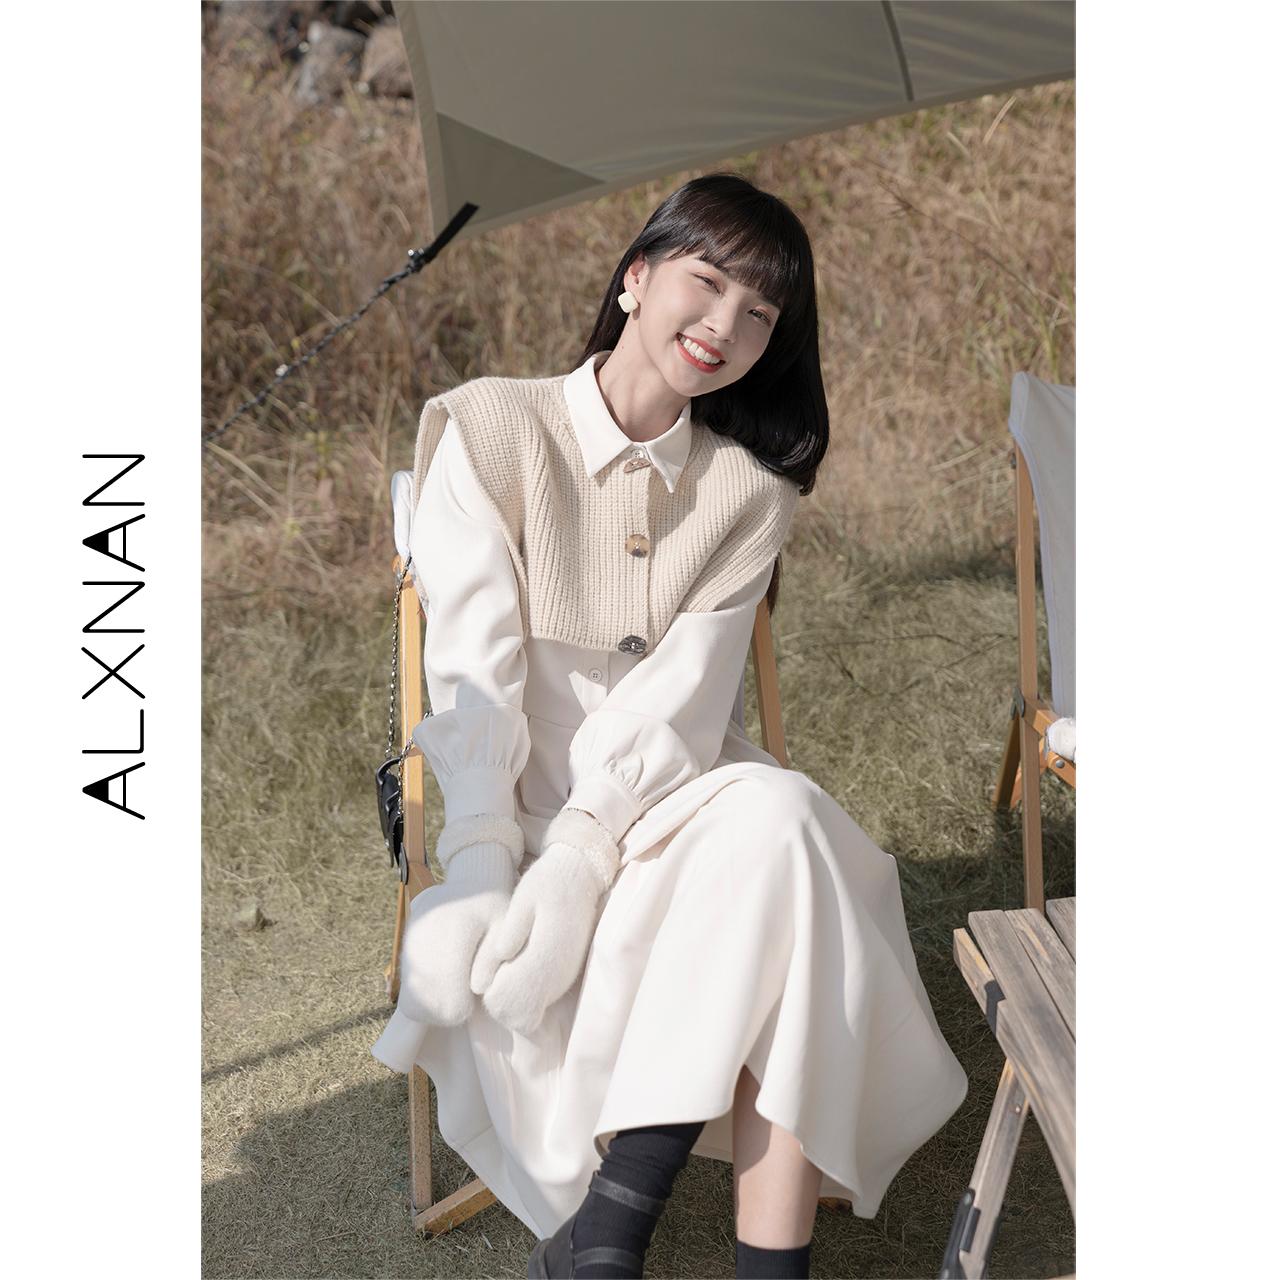 Deer Xiangnan Short apricot sweater with skirt Western style two-piece temperament doll collar skirt female winter dress